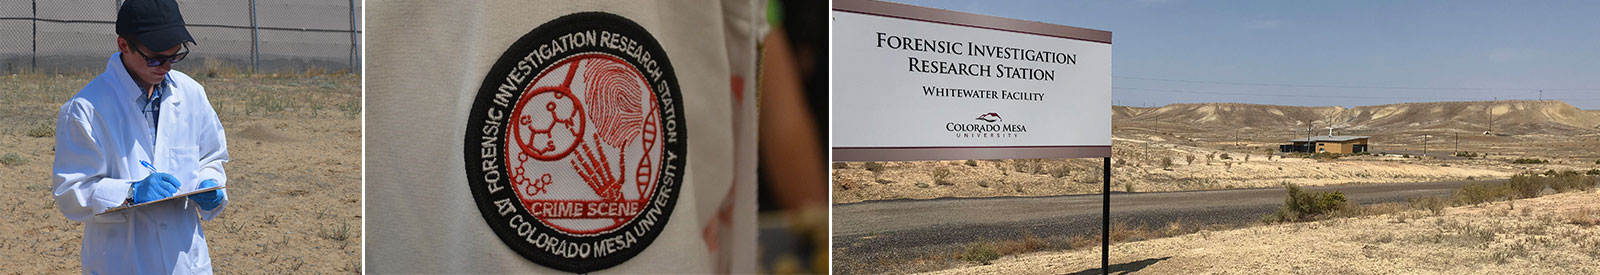 Body Donation | Colorado Mesa Univ